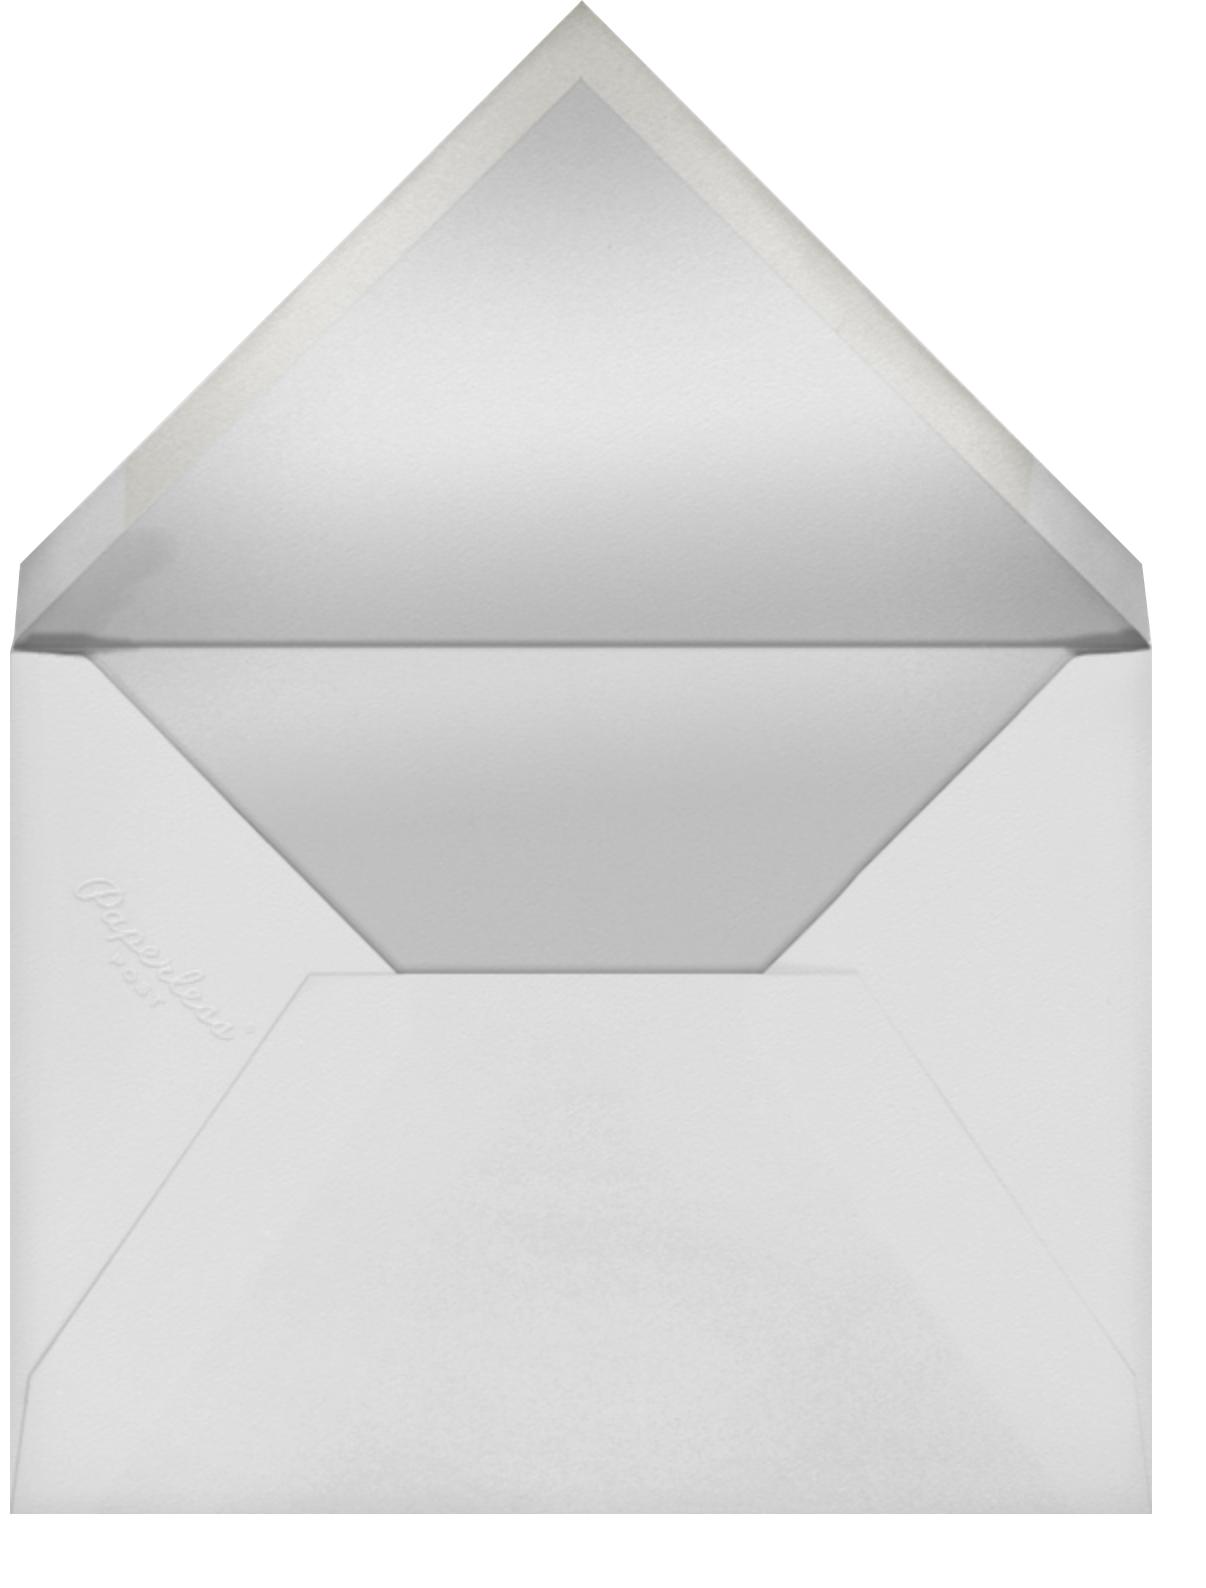 Confetti (Menu) - Blush/Gold - kate spade new york - Menus and programs - envelope back